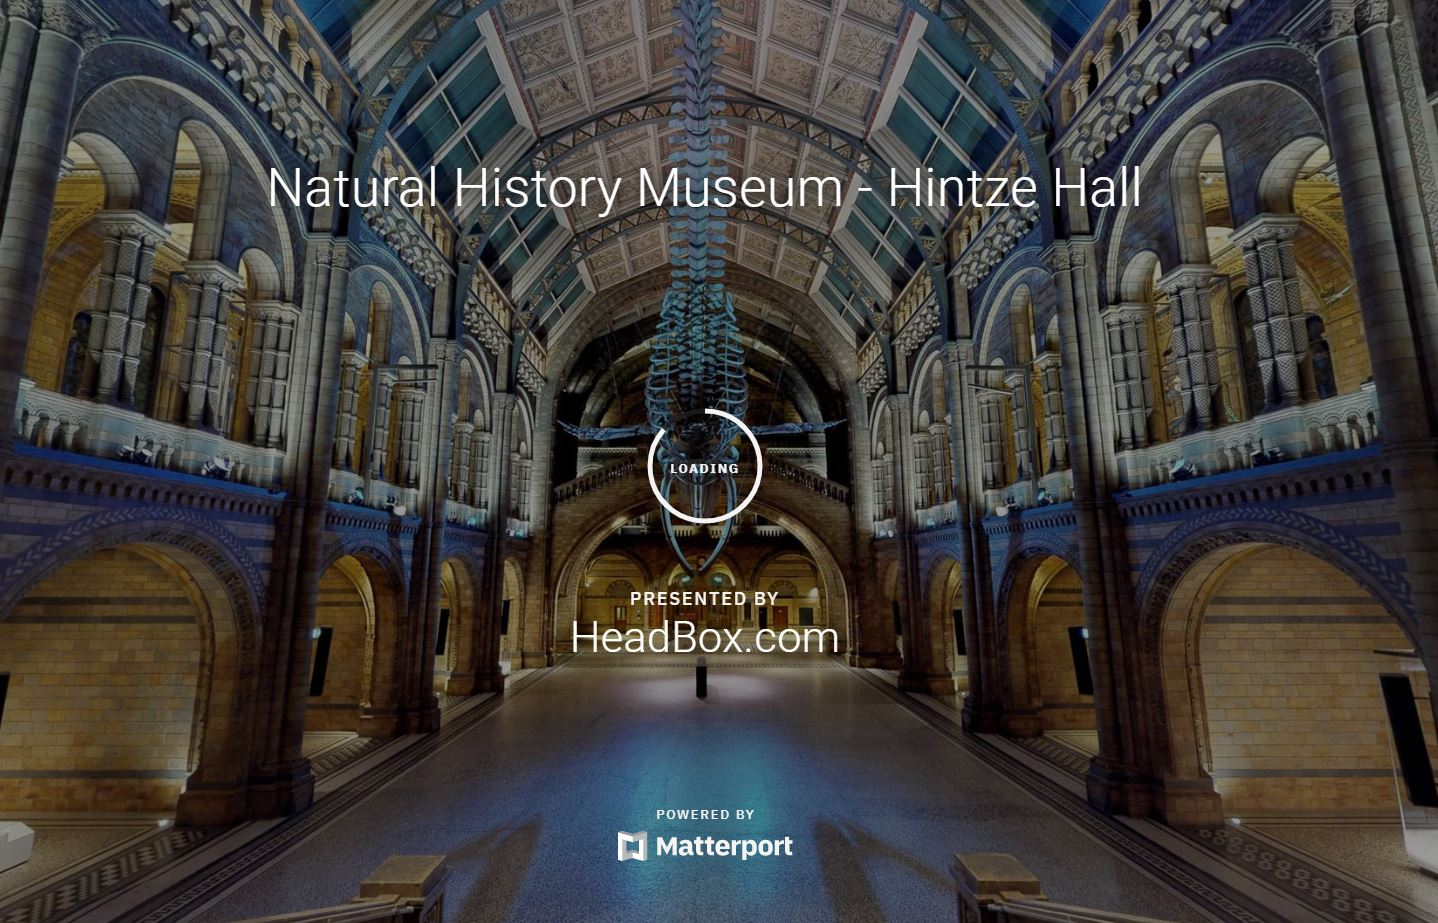 Natural History Museum 3D - 360 Virtual Tour May 26 2020